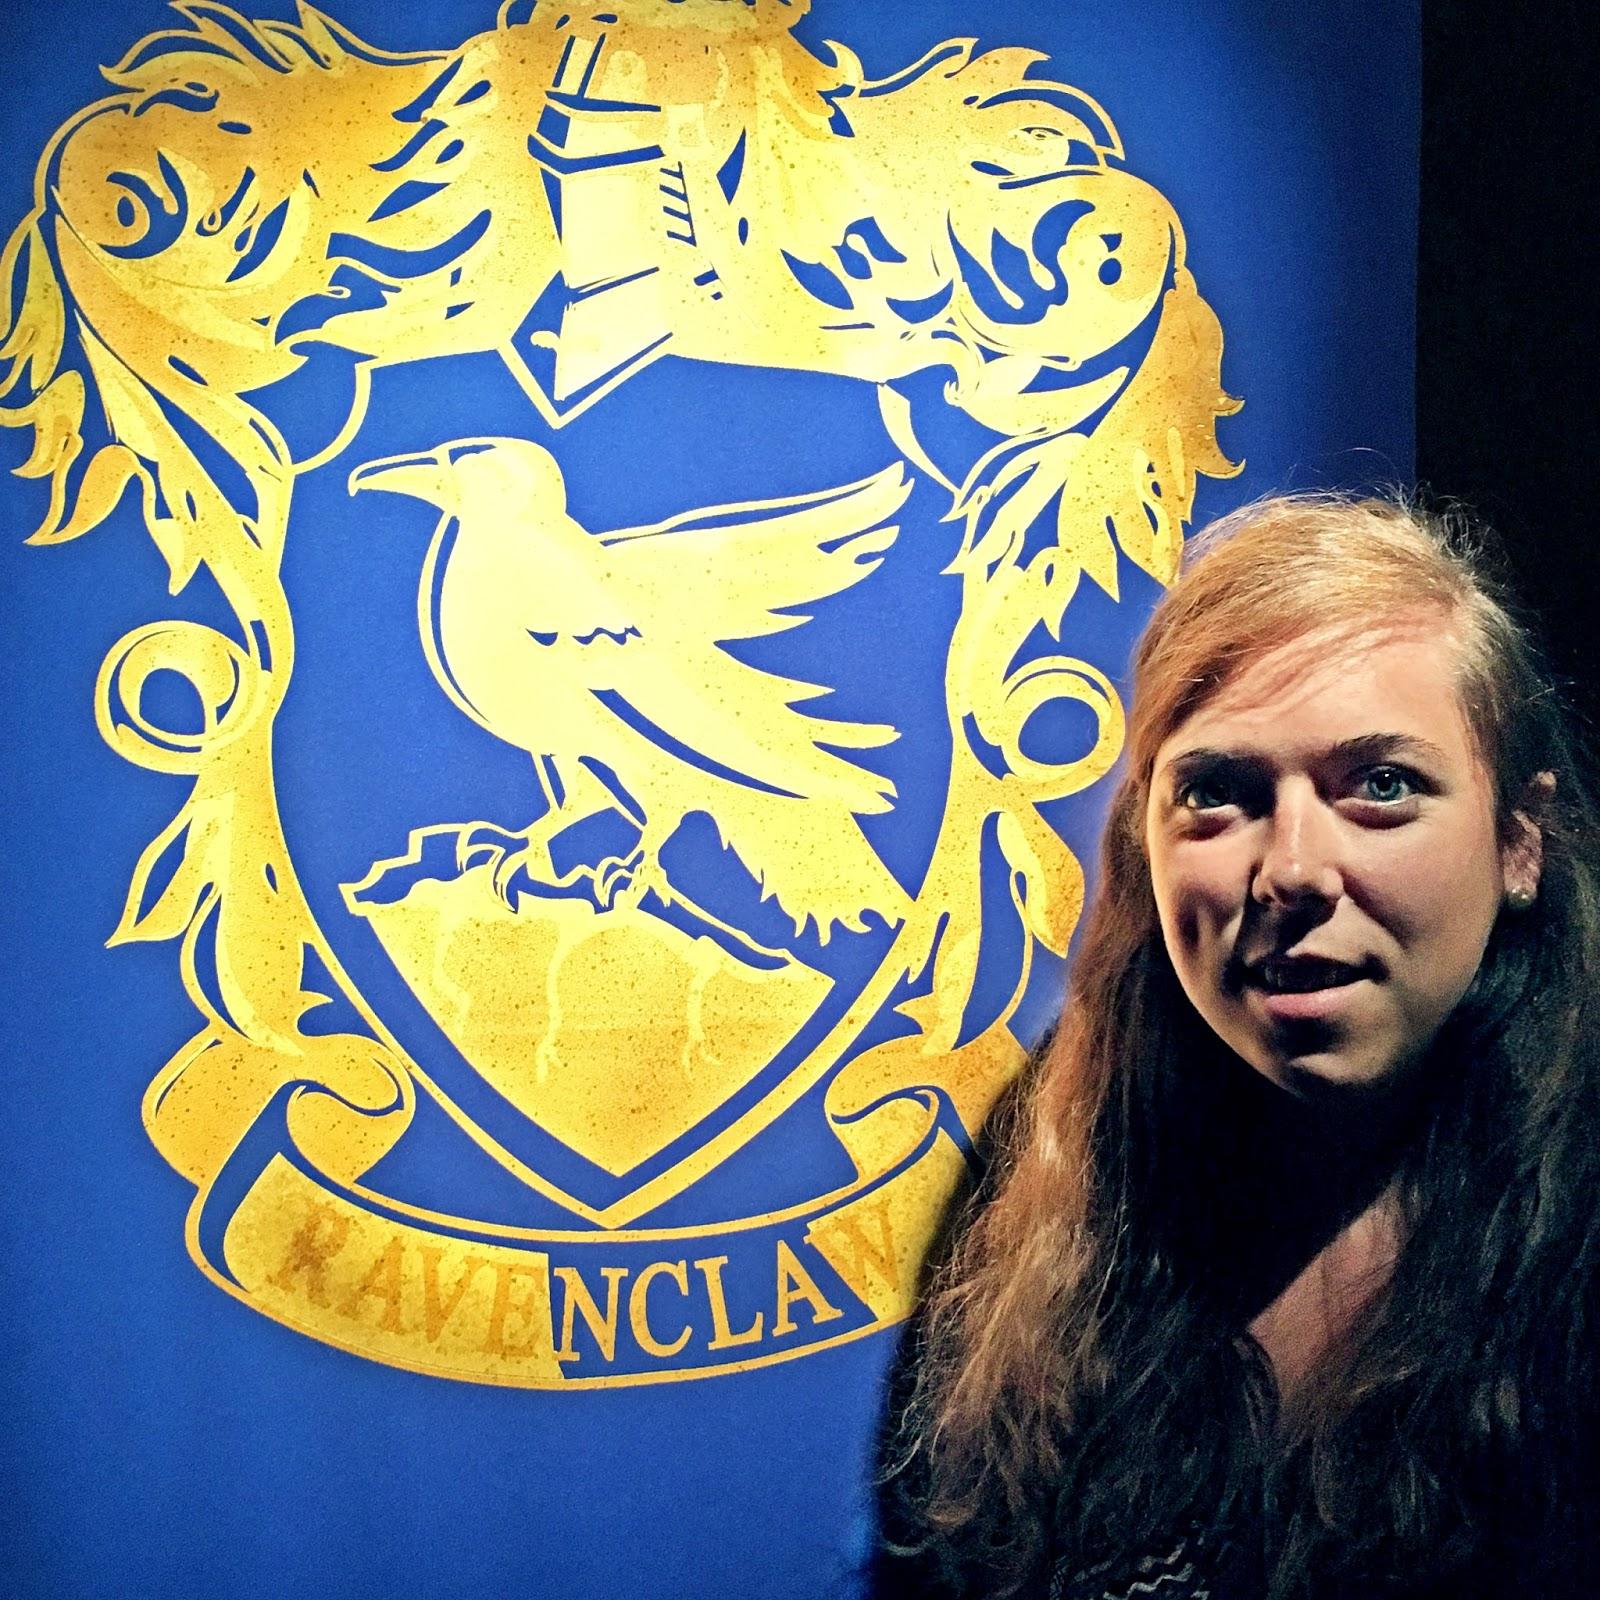 hogwarts ravenclaw